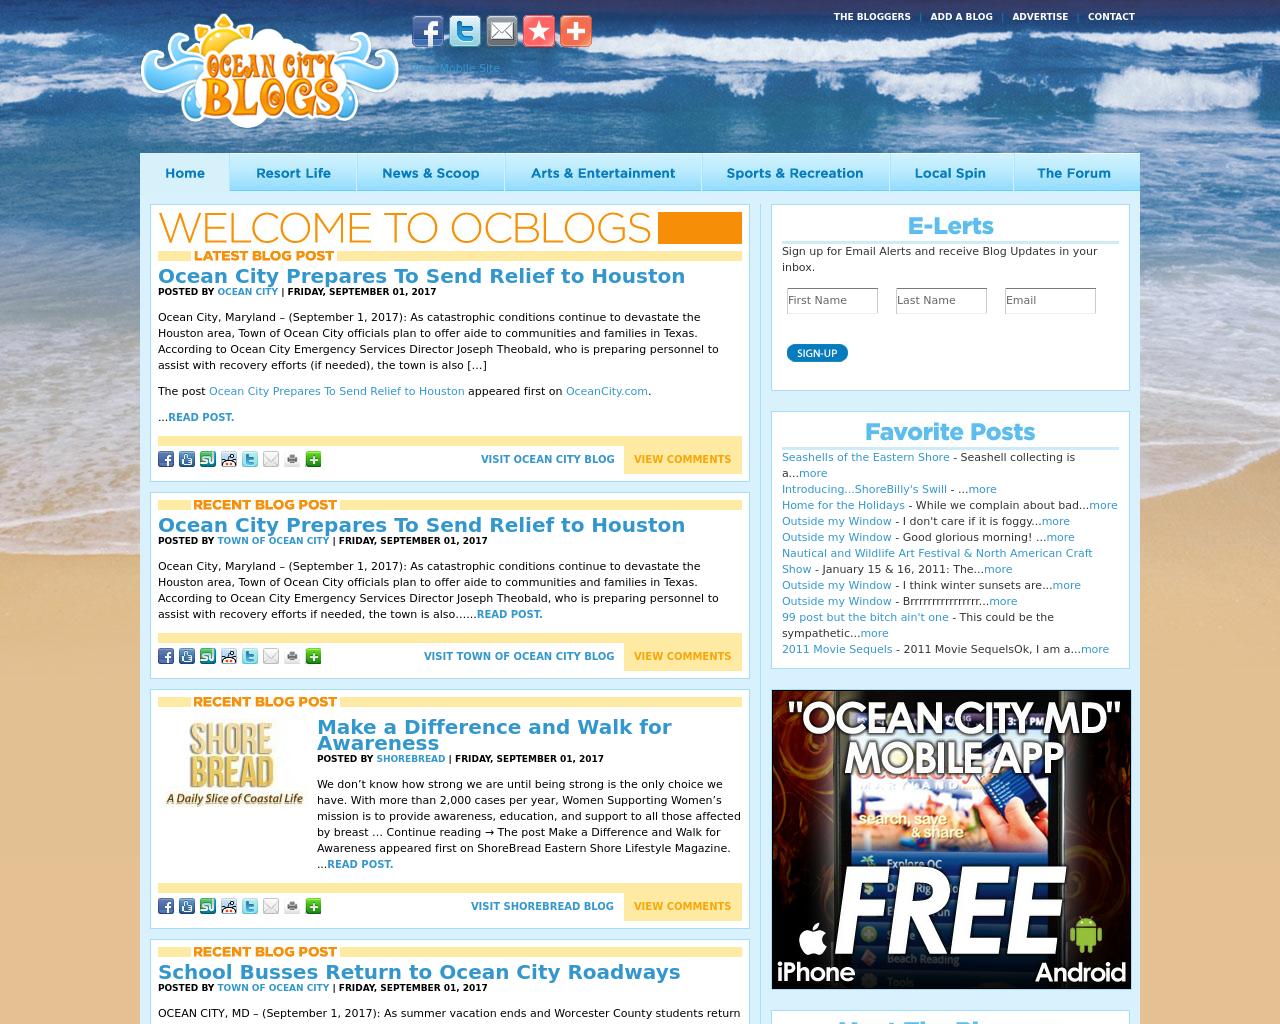 OCEAN-CITY-BLOGS-Advertising-Reviews-Pricing